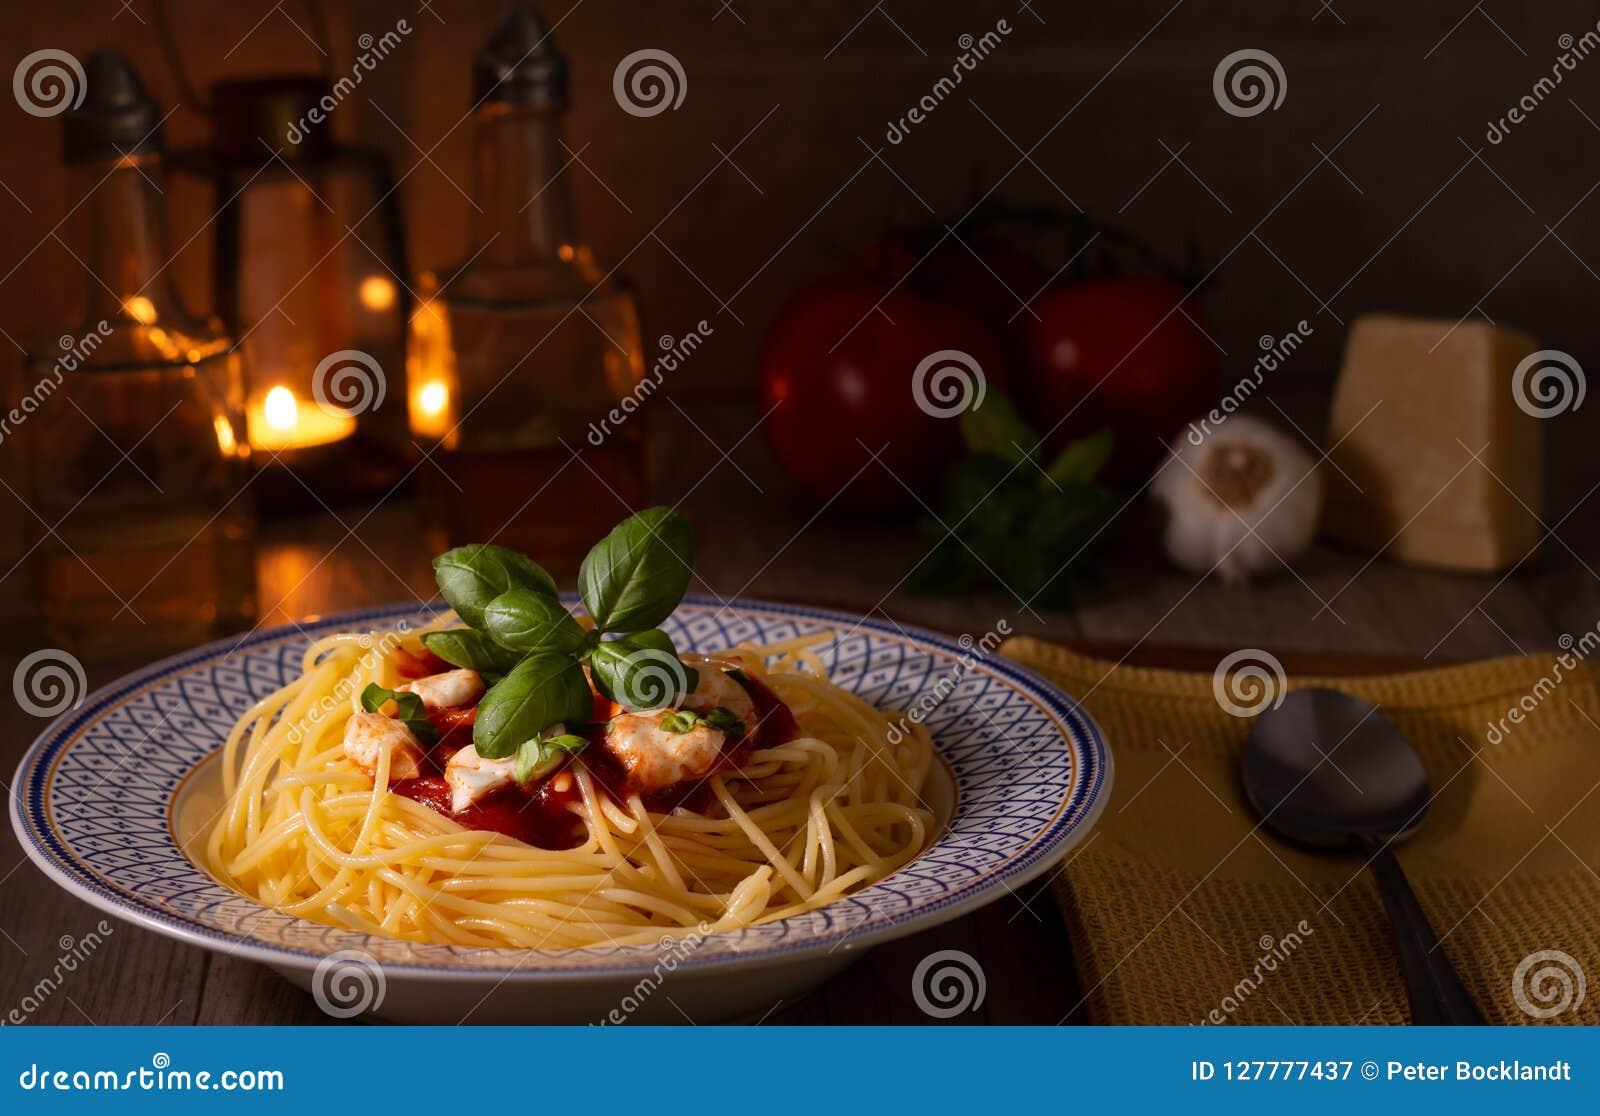 Spaghettis mit Mozzarella und Tomatensauce